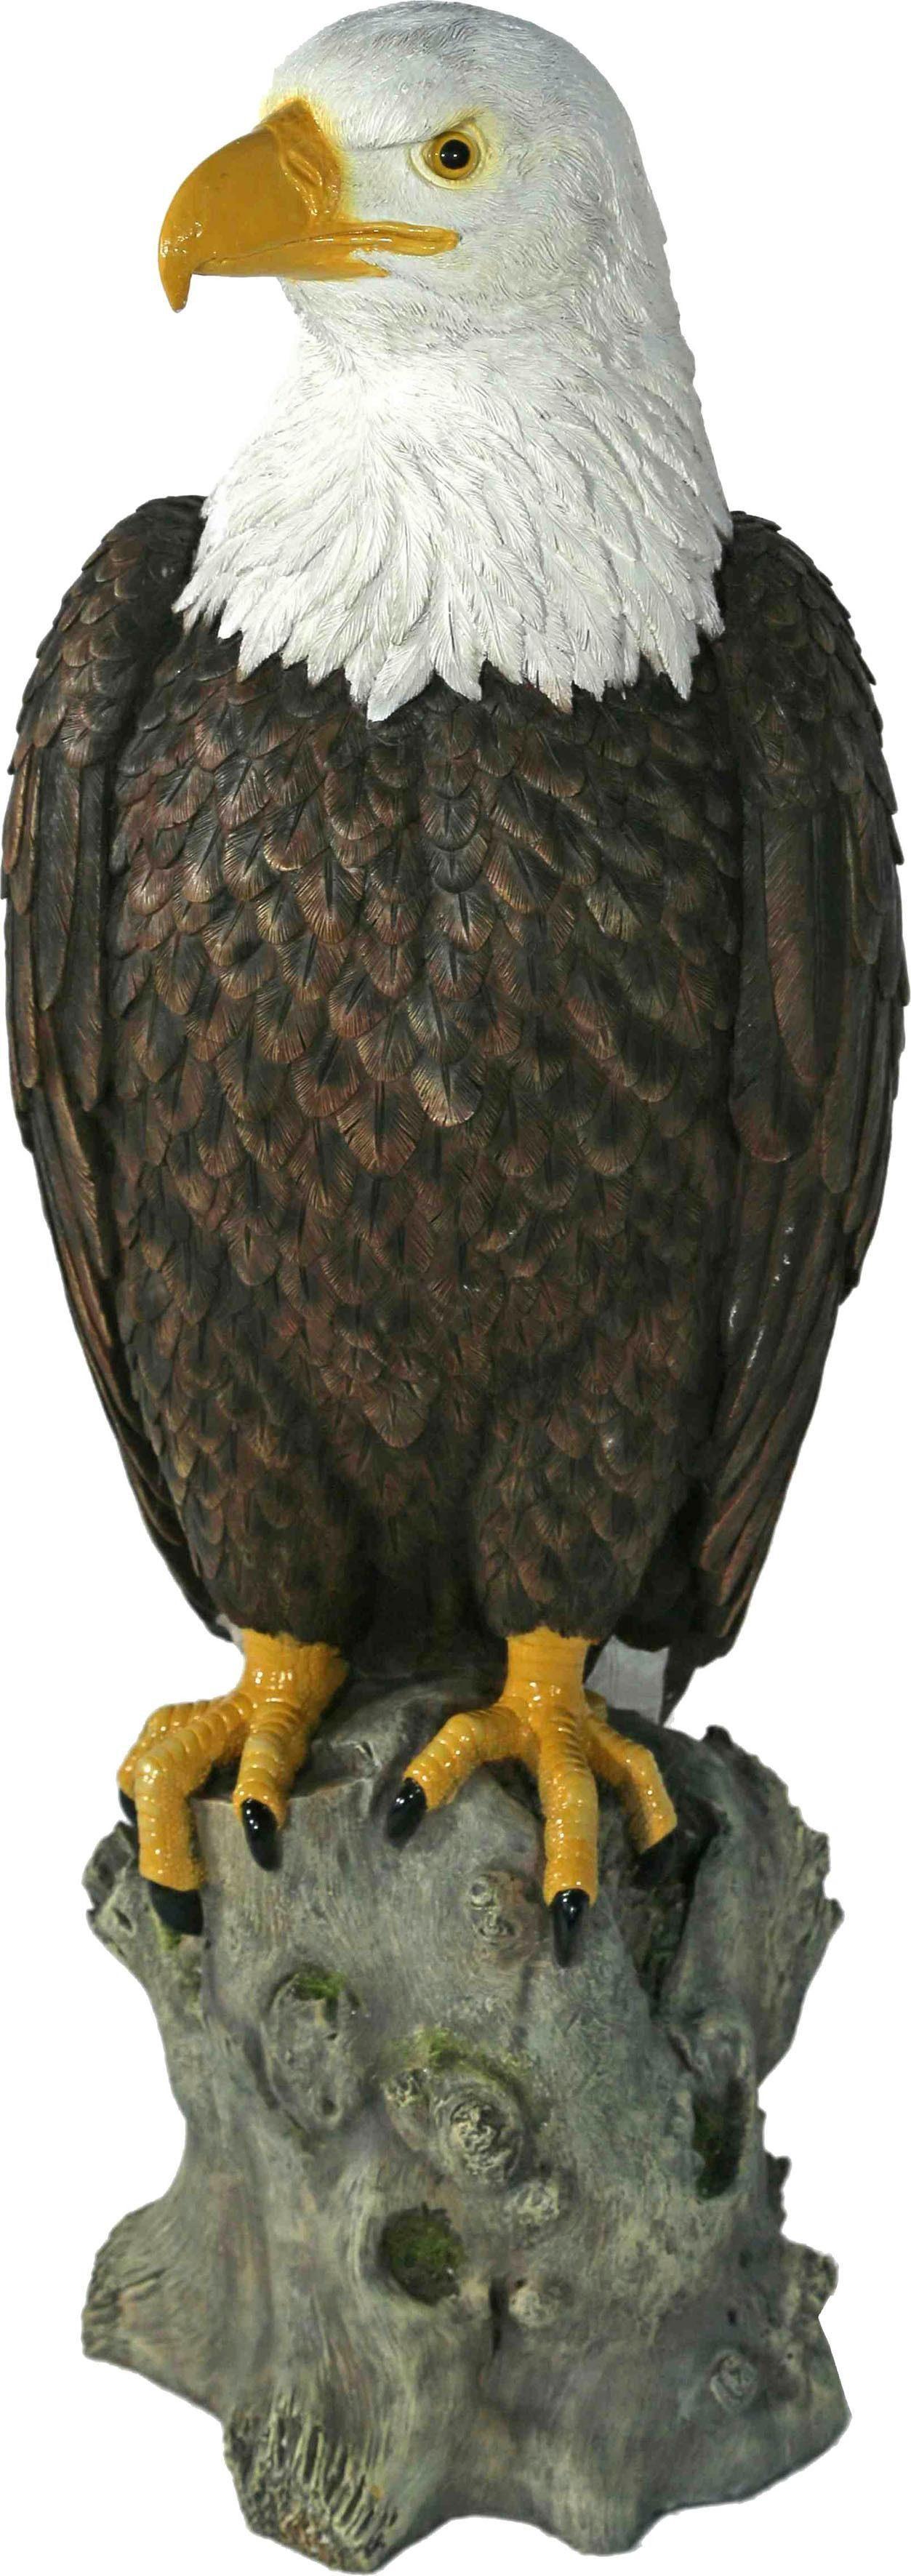 Home affaire Dekofigur »Adler auf Felsen sitzend«, Höhe 54 cm